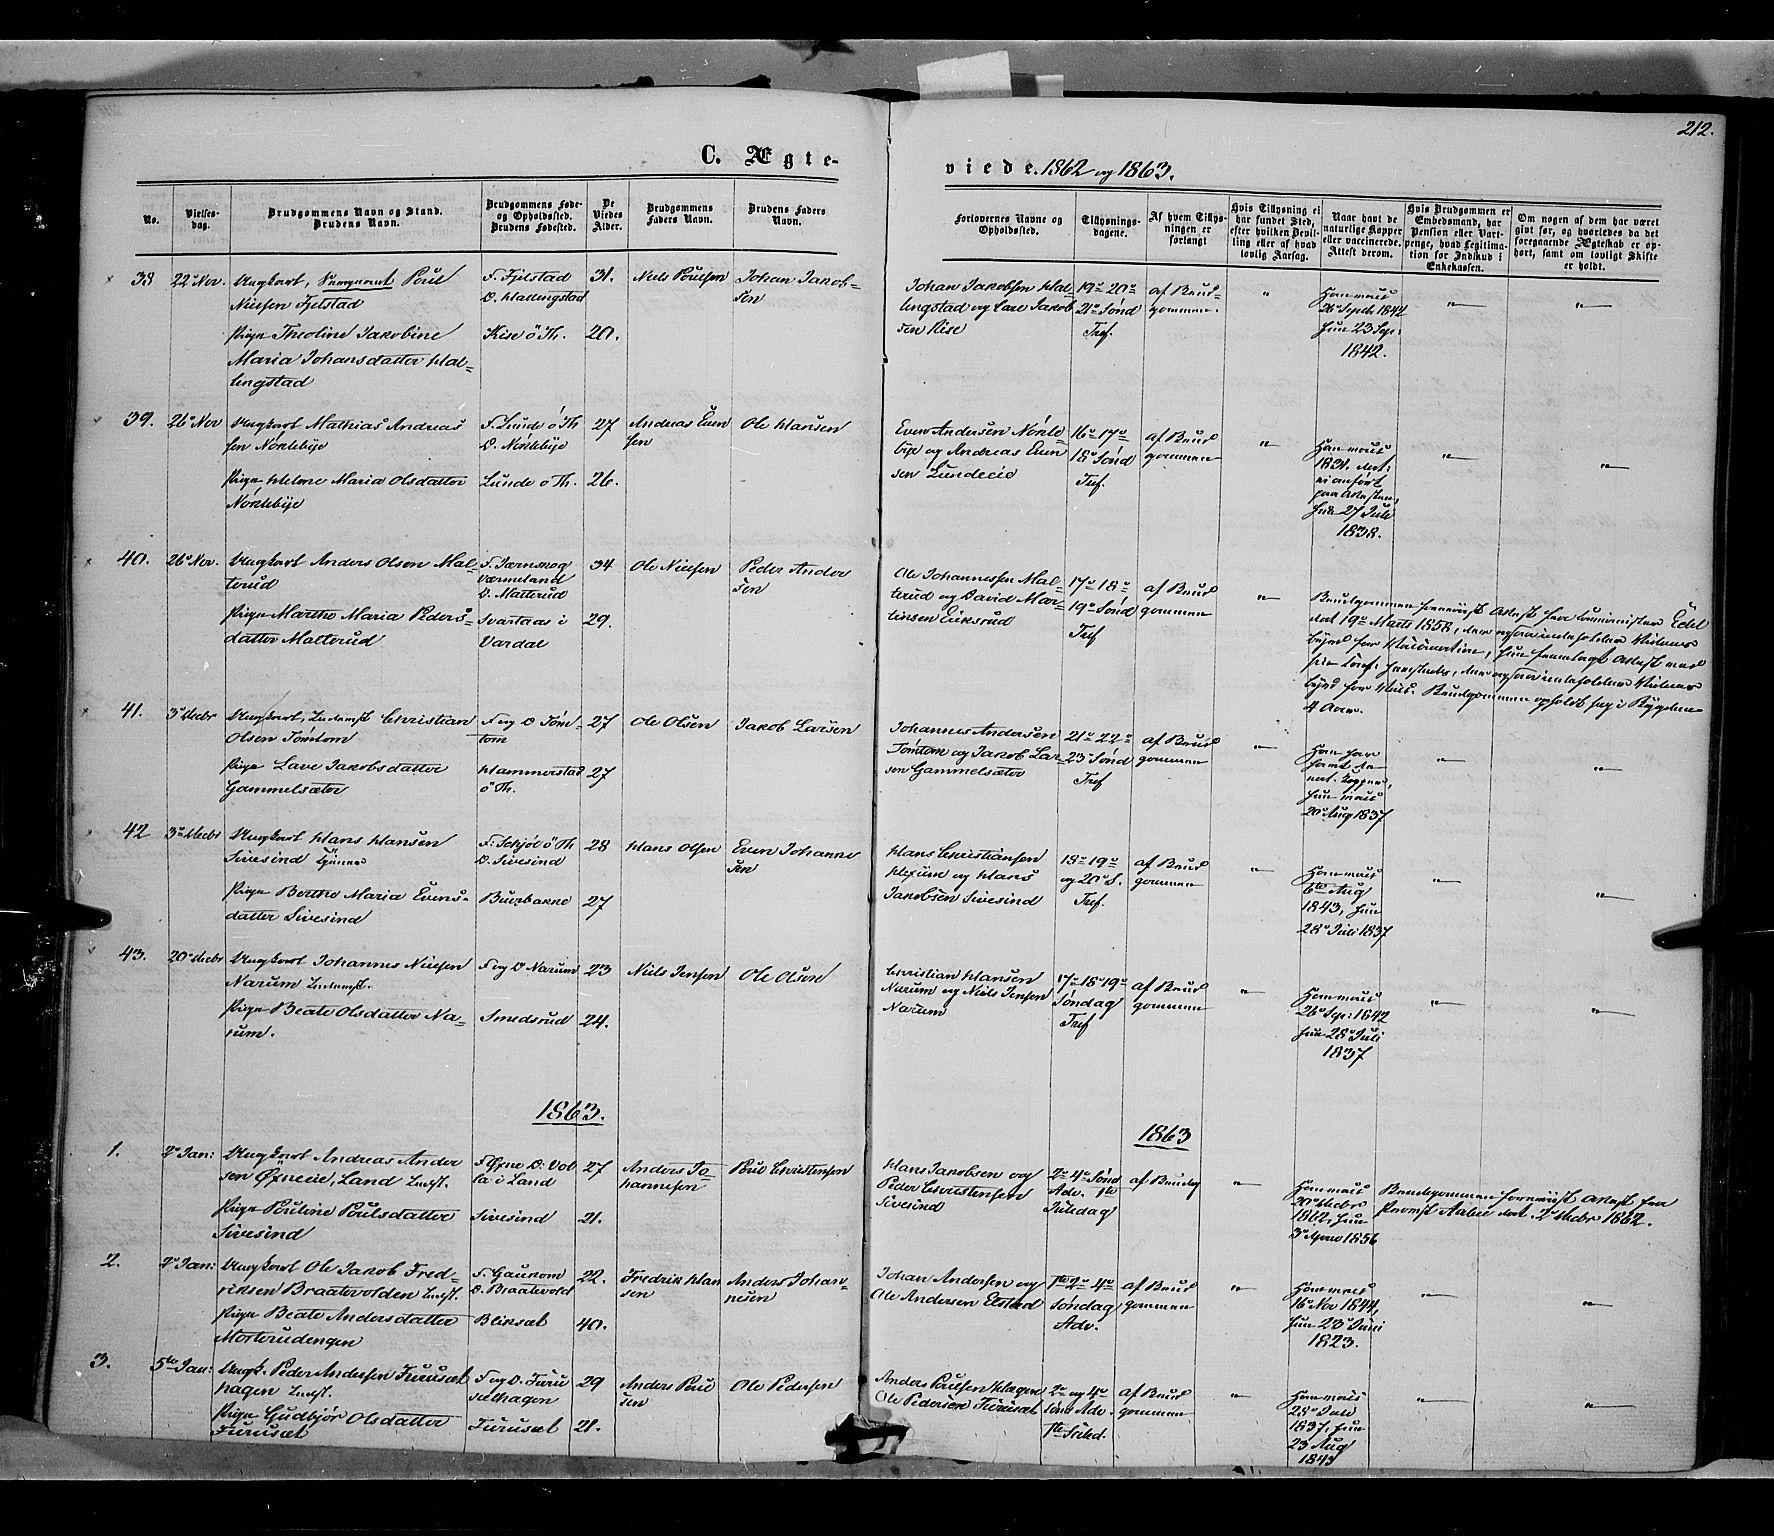 SAH, Vestre Toten prestekontor, H/Ha/Haa/L0007: Ministerialbok nr. 7, 1862-1869, s. 212